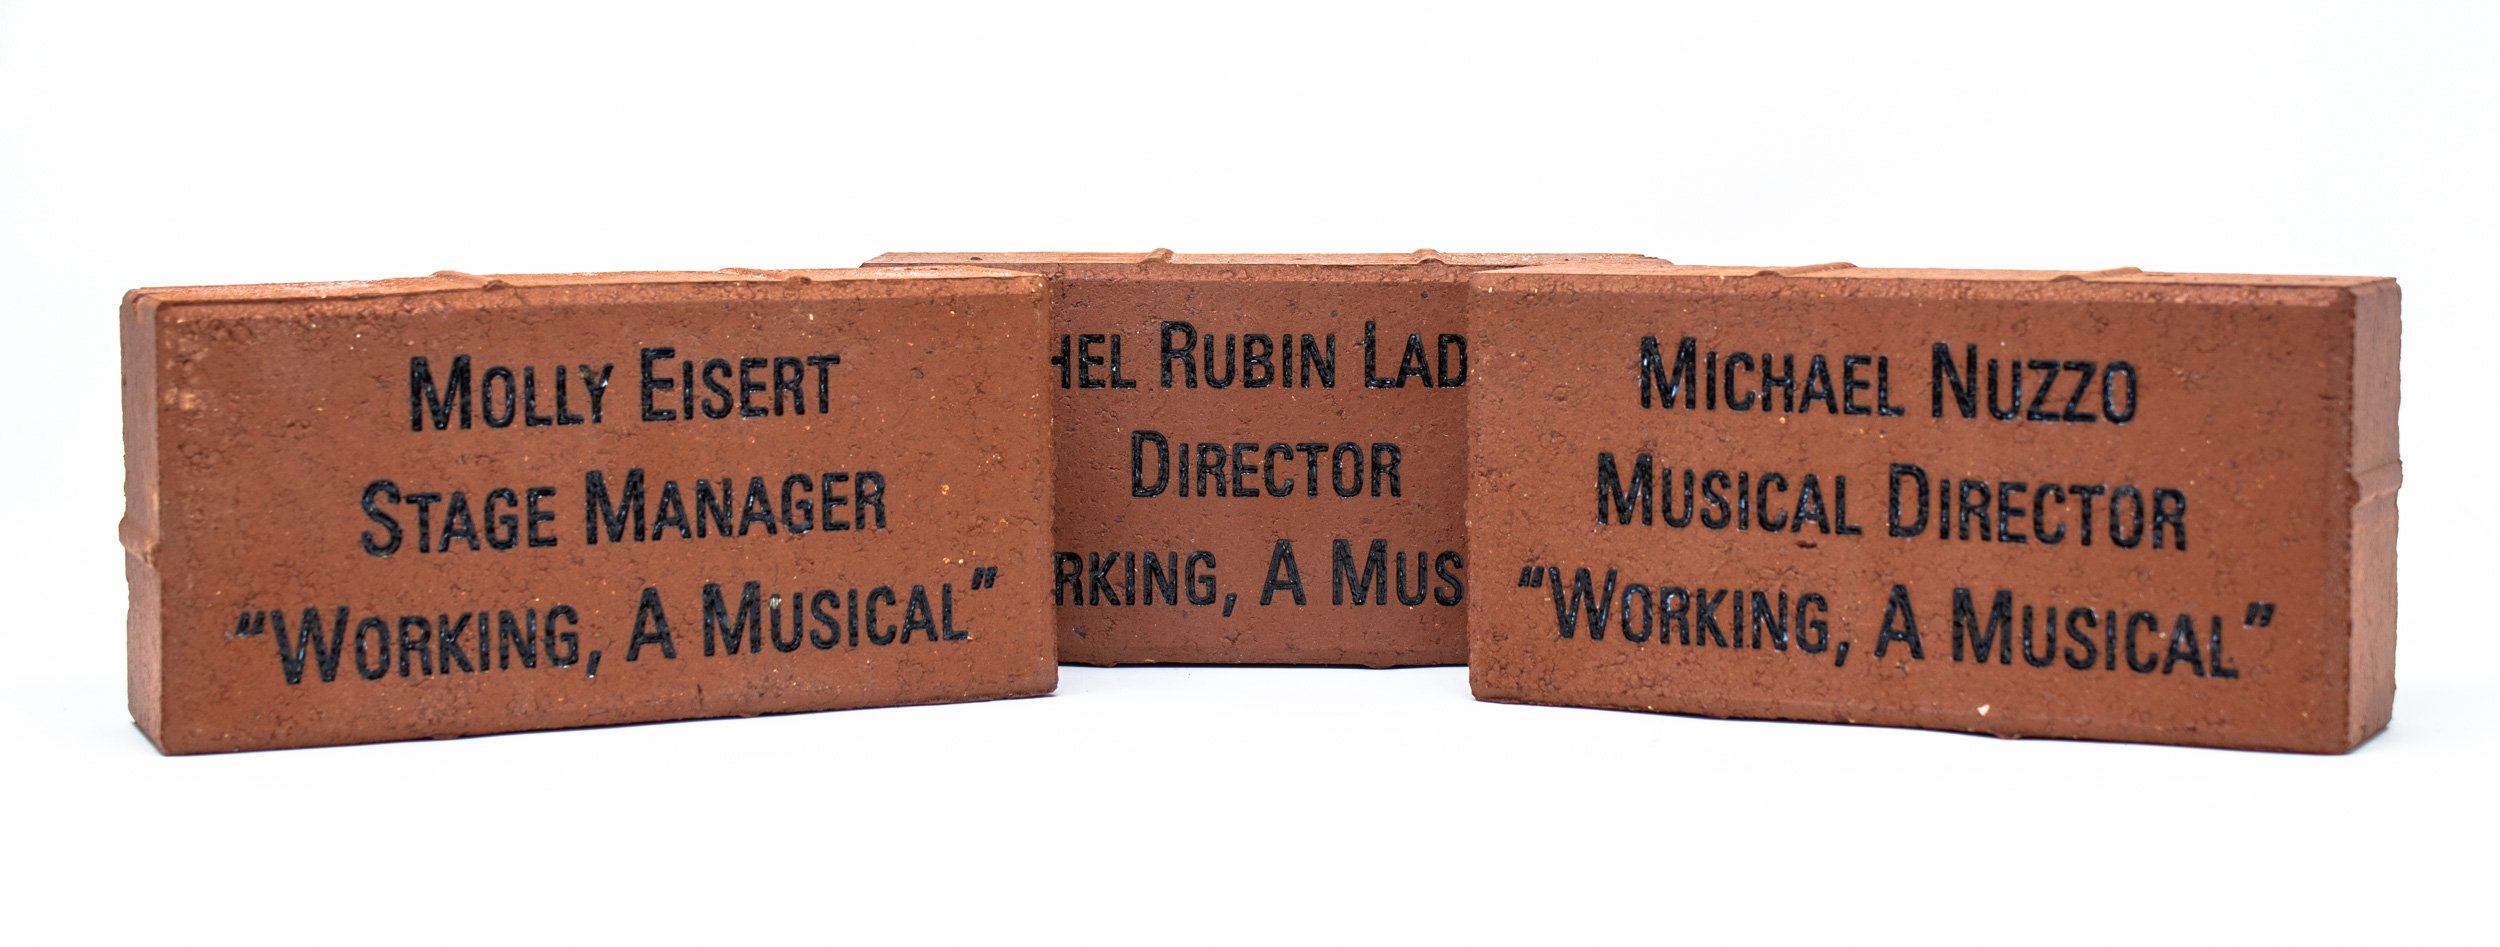 Custom Engraved Memorial Bricks